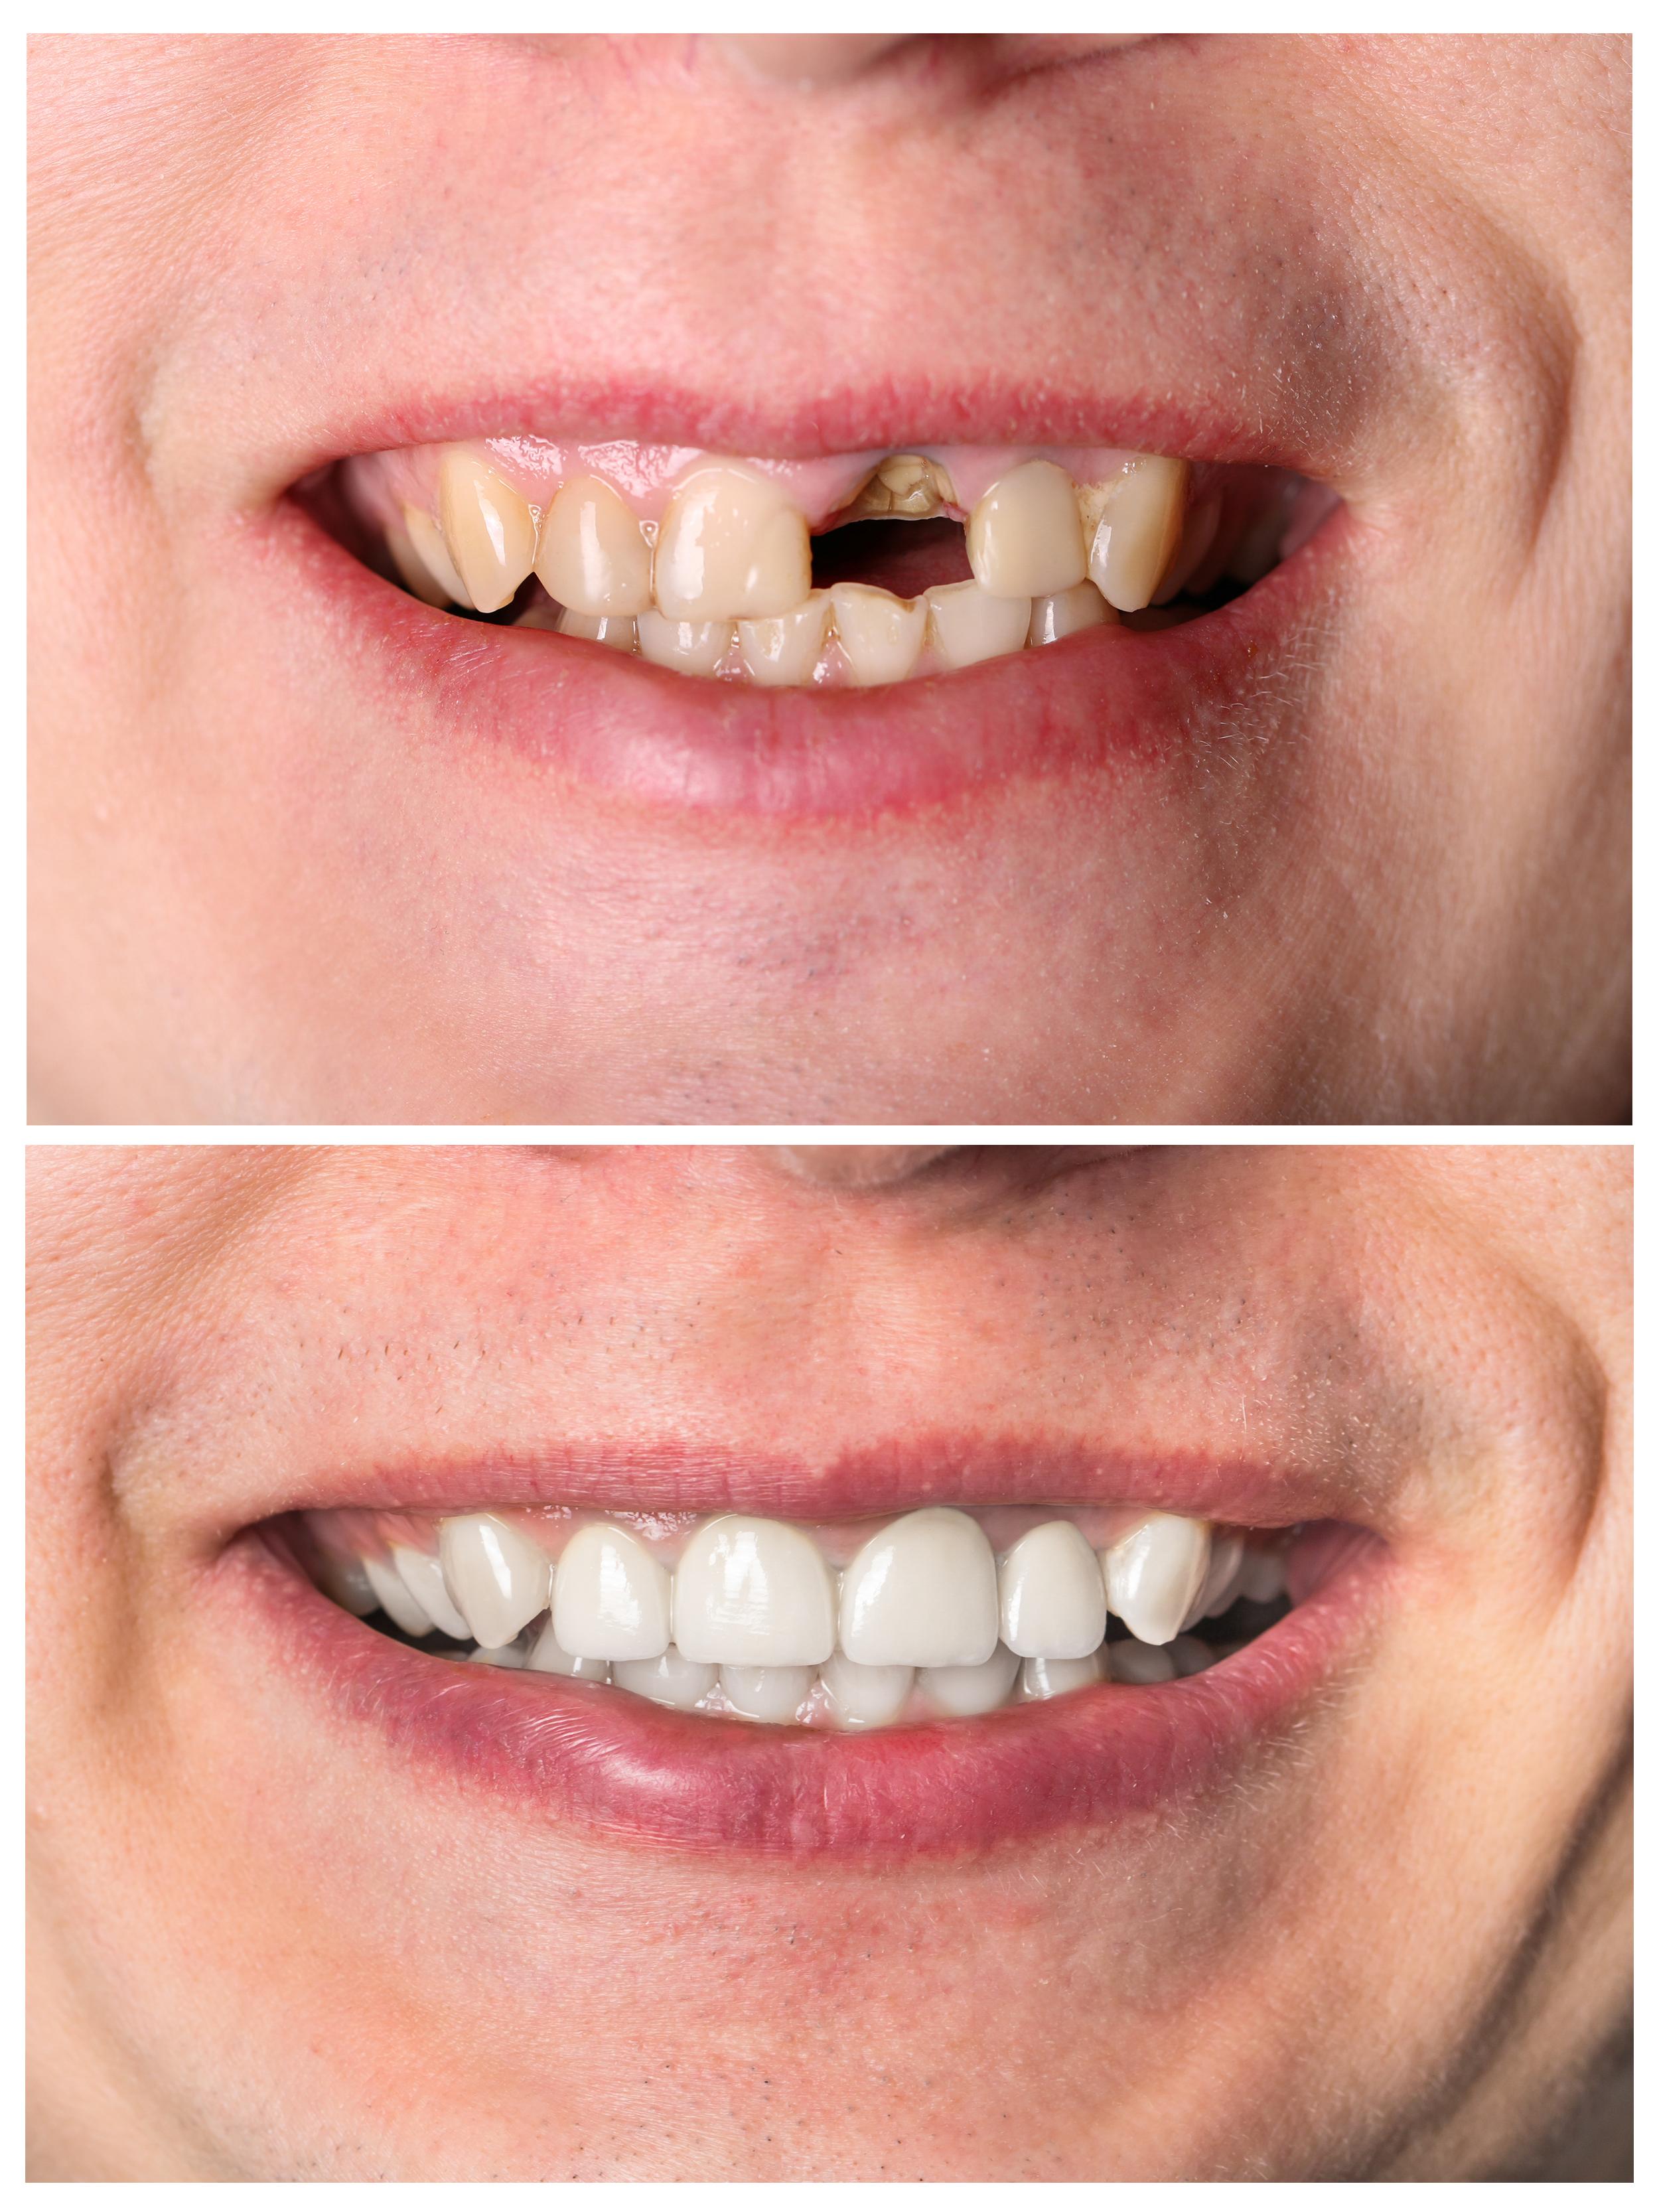 Linthorpe House Dentistry & Aesthetics